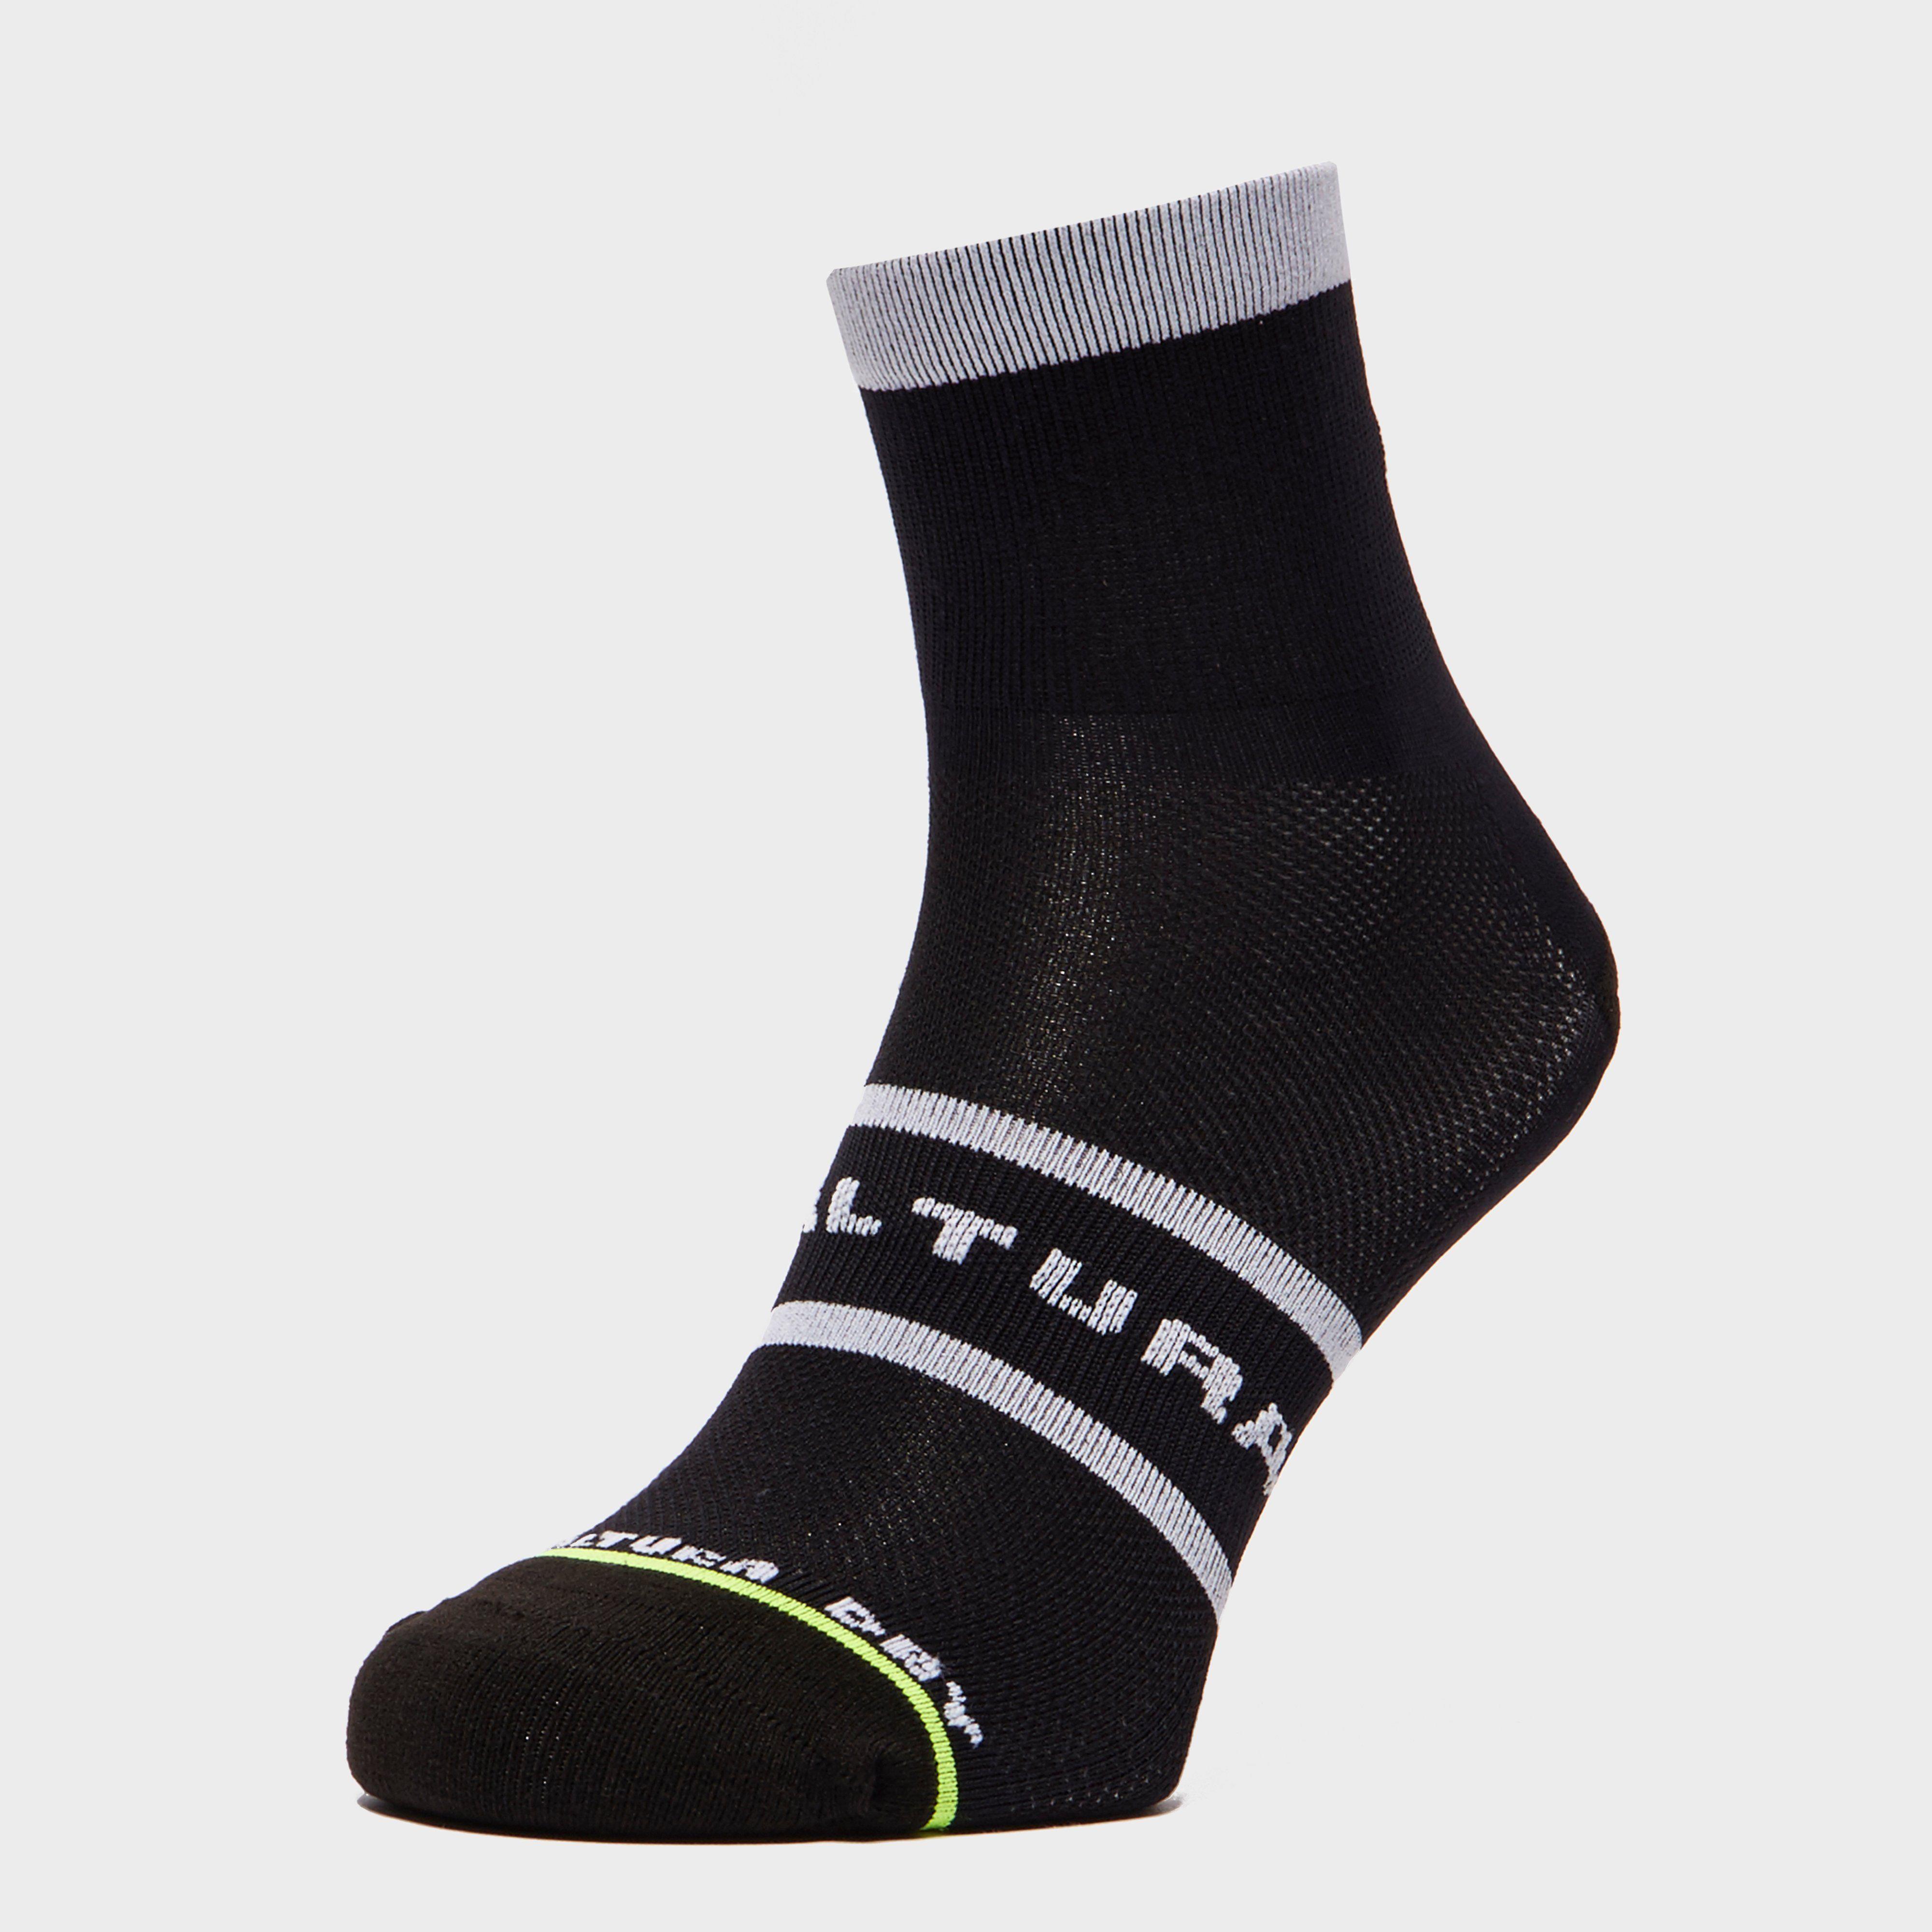 ALTURA Altura Dry Socks